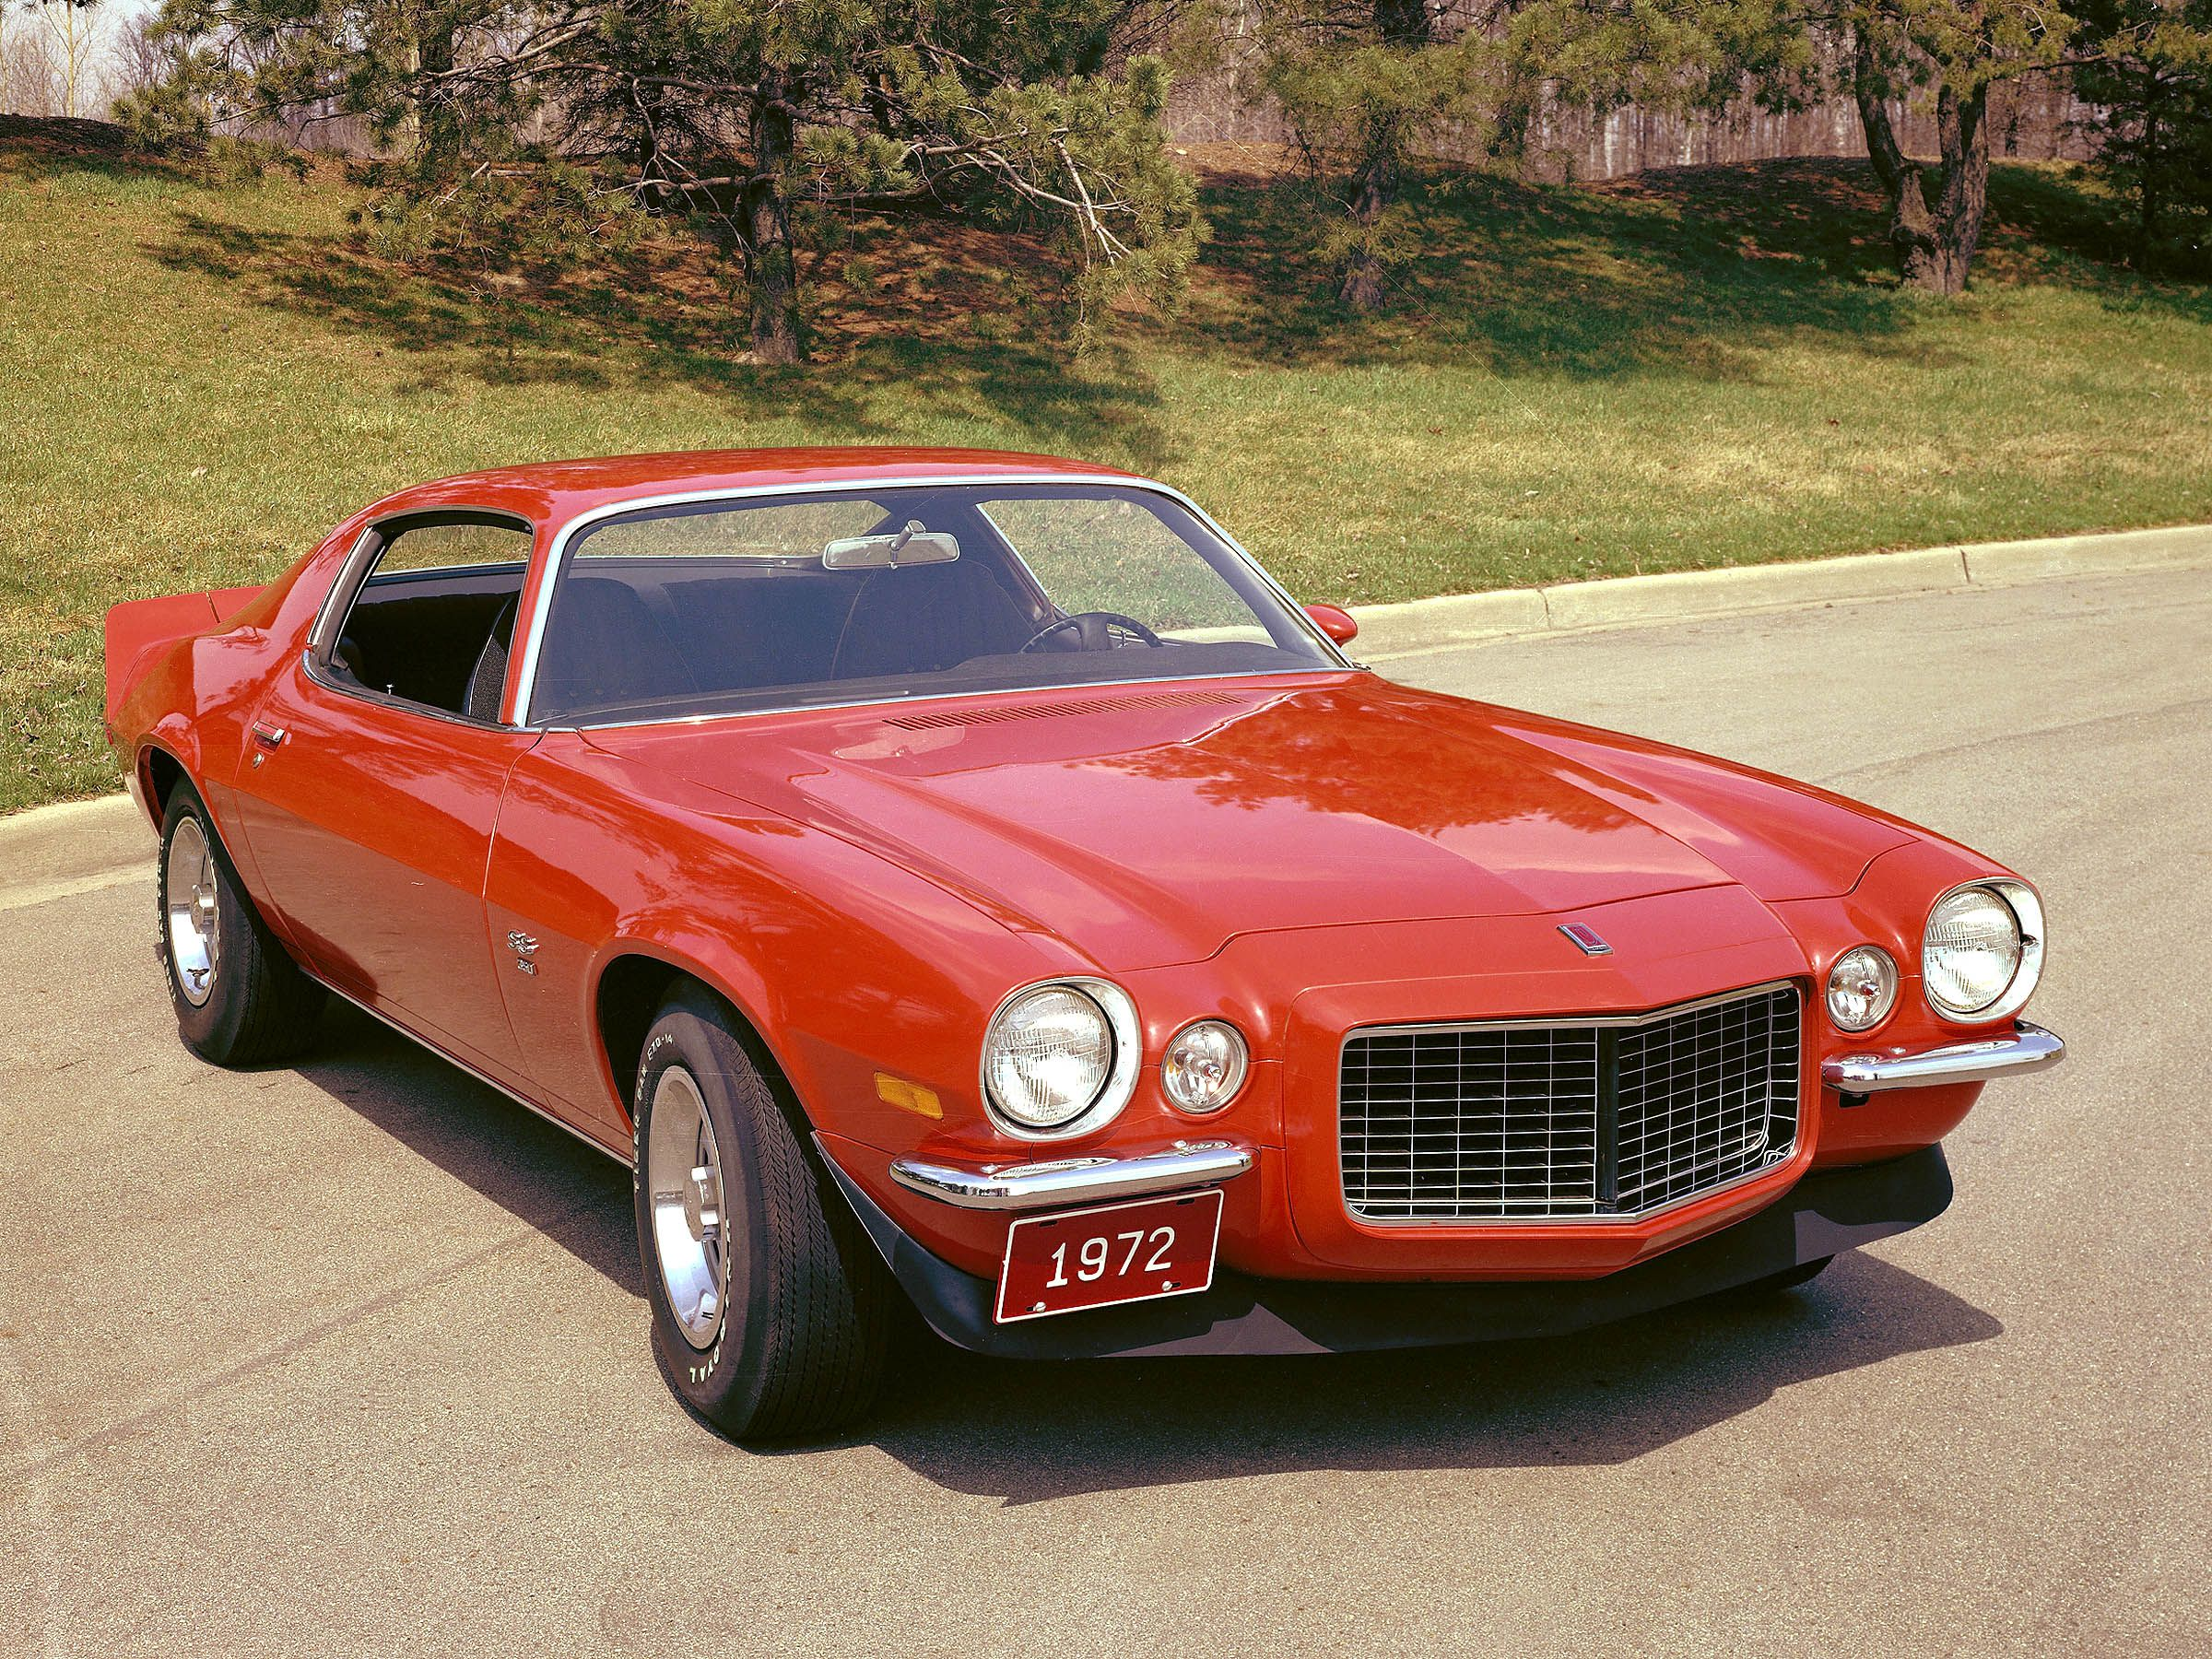 1972 Chevrolet Camaro Z28 Jpg 2400 1800 アメ車 車